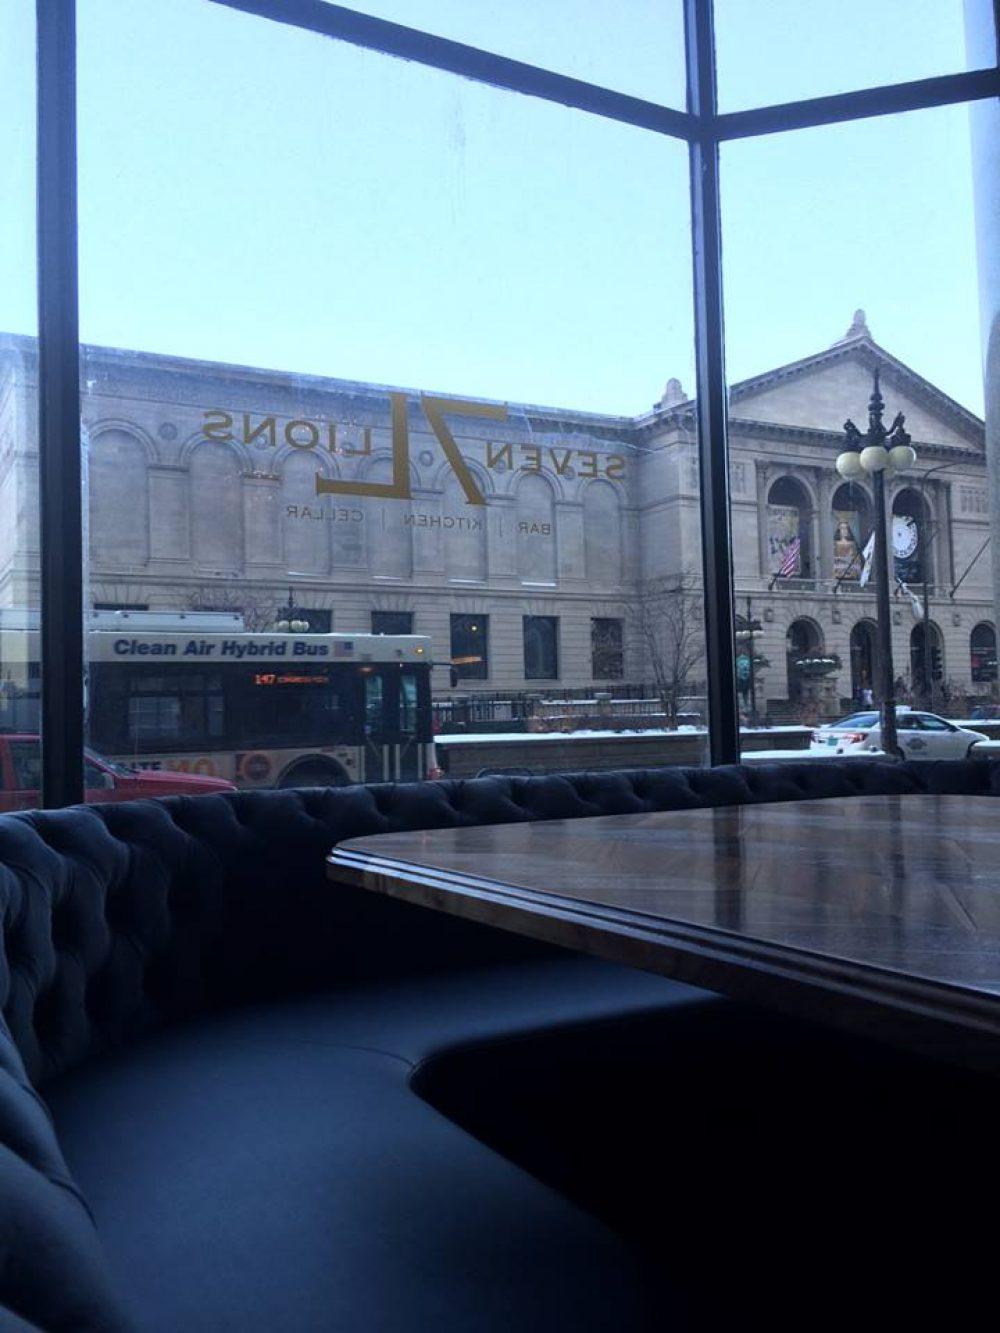 Seven Lions Art Institute